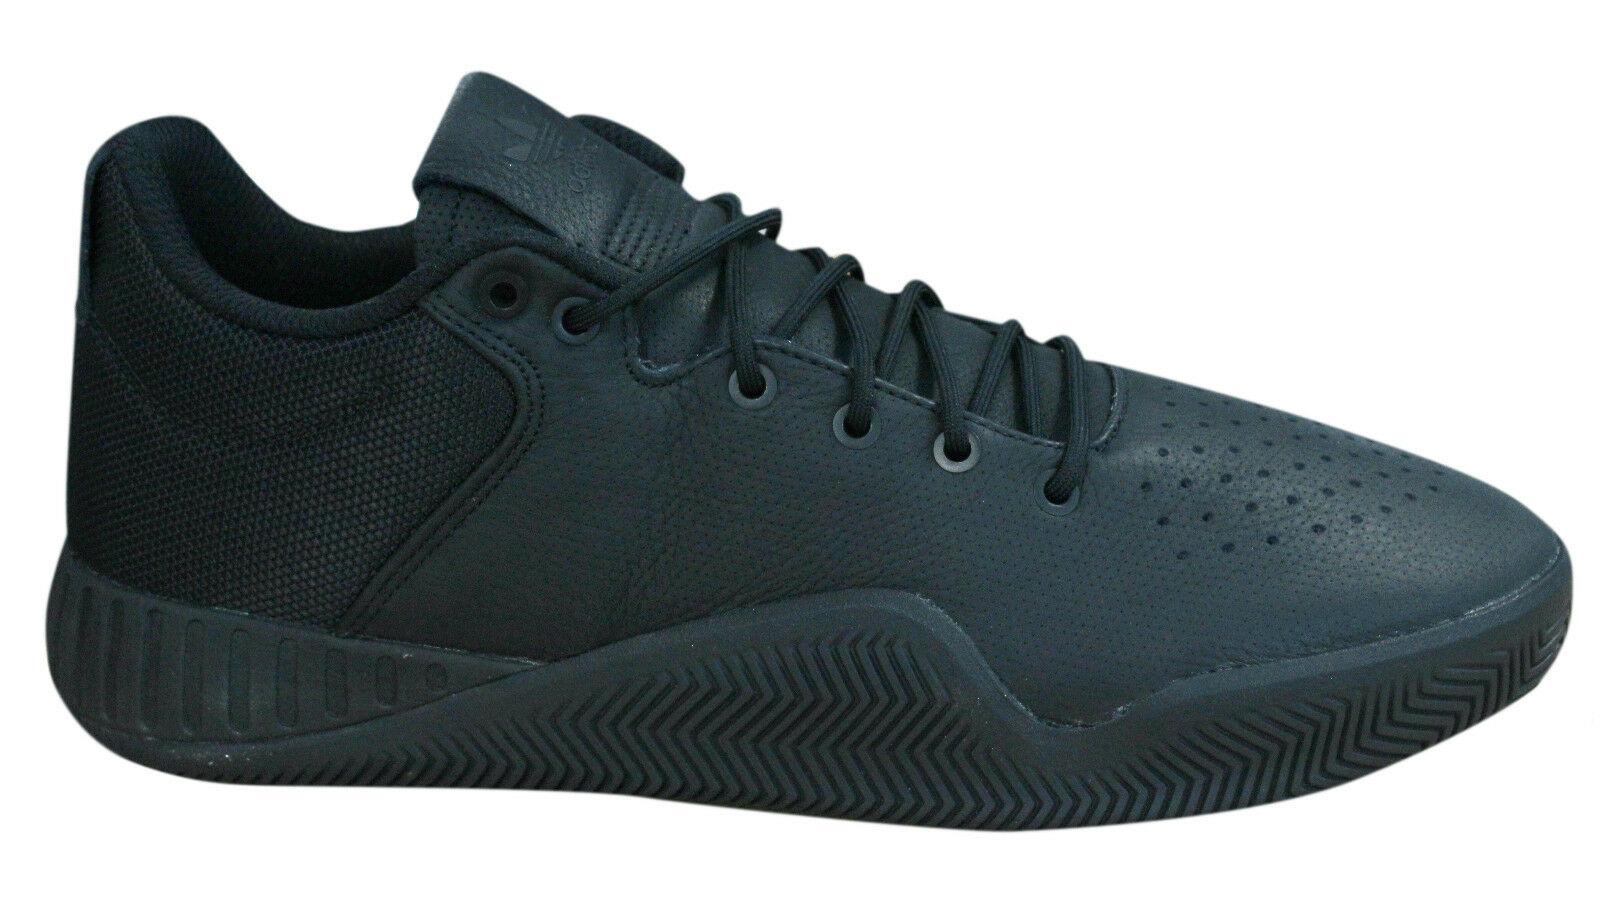 Adidas Originals Tubular Instinct Low Lace Up Mens Trainers Black ...